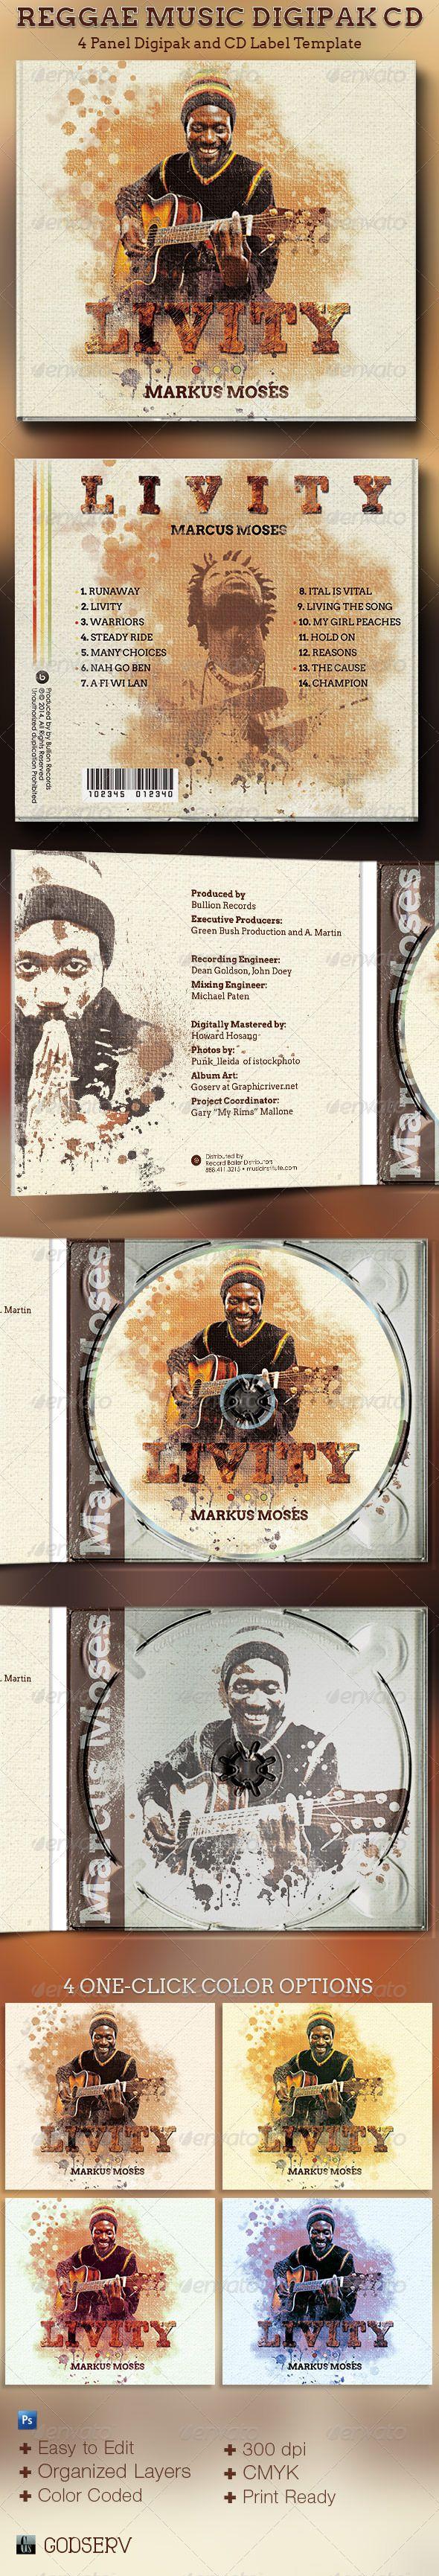 Reggae Music 4 Panel Digipak CD Artwork Template | Kunstwerke ...